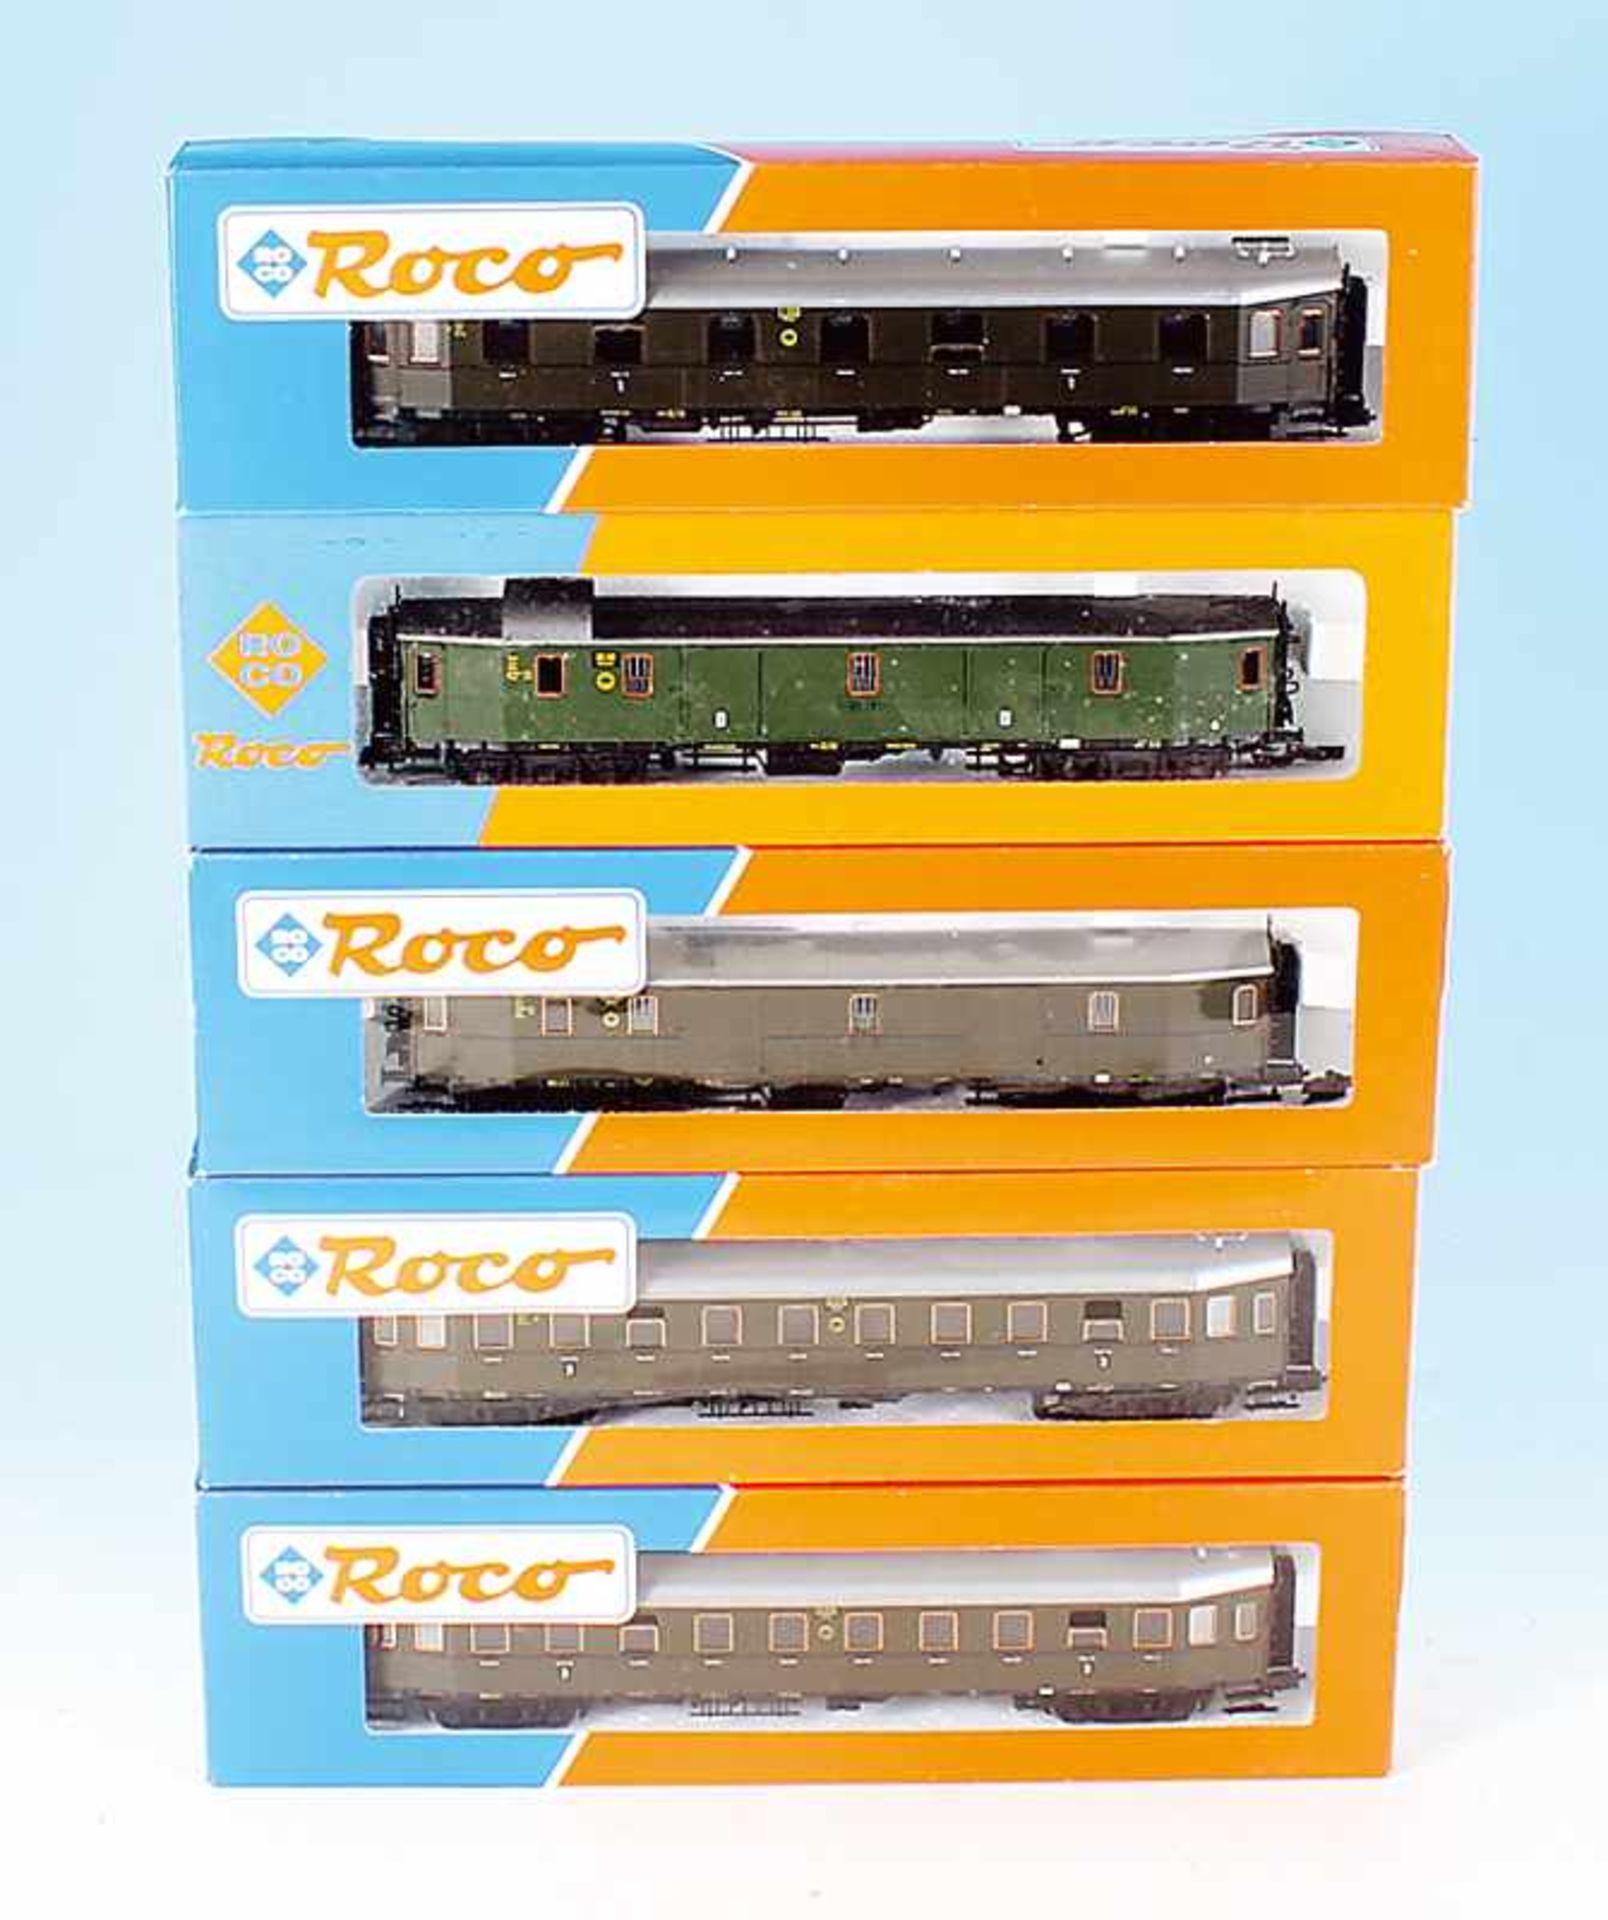 Los 51 - 5 ROCO Personen- und Packwagen